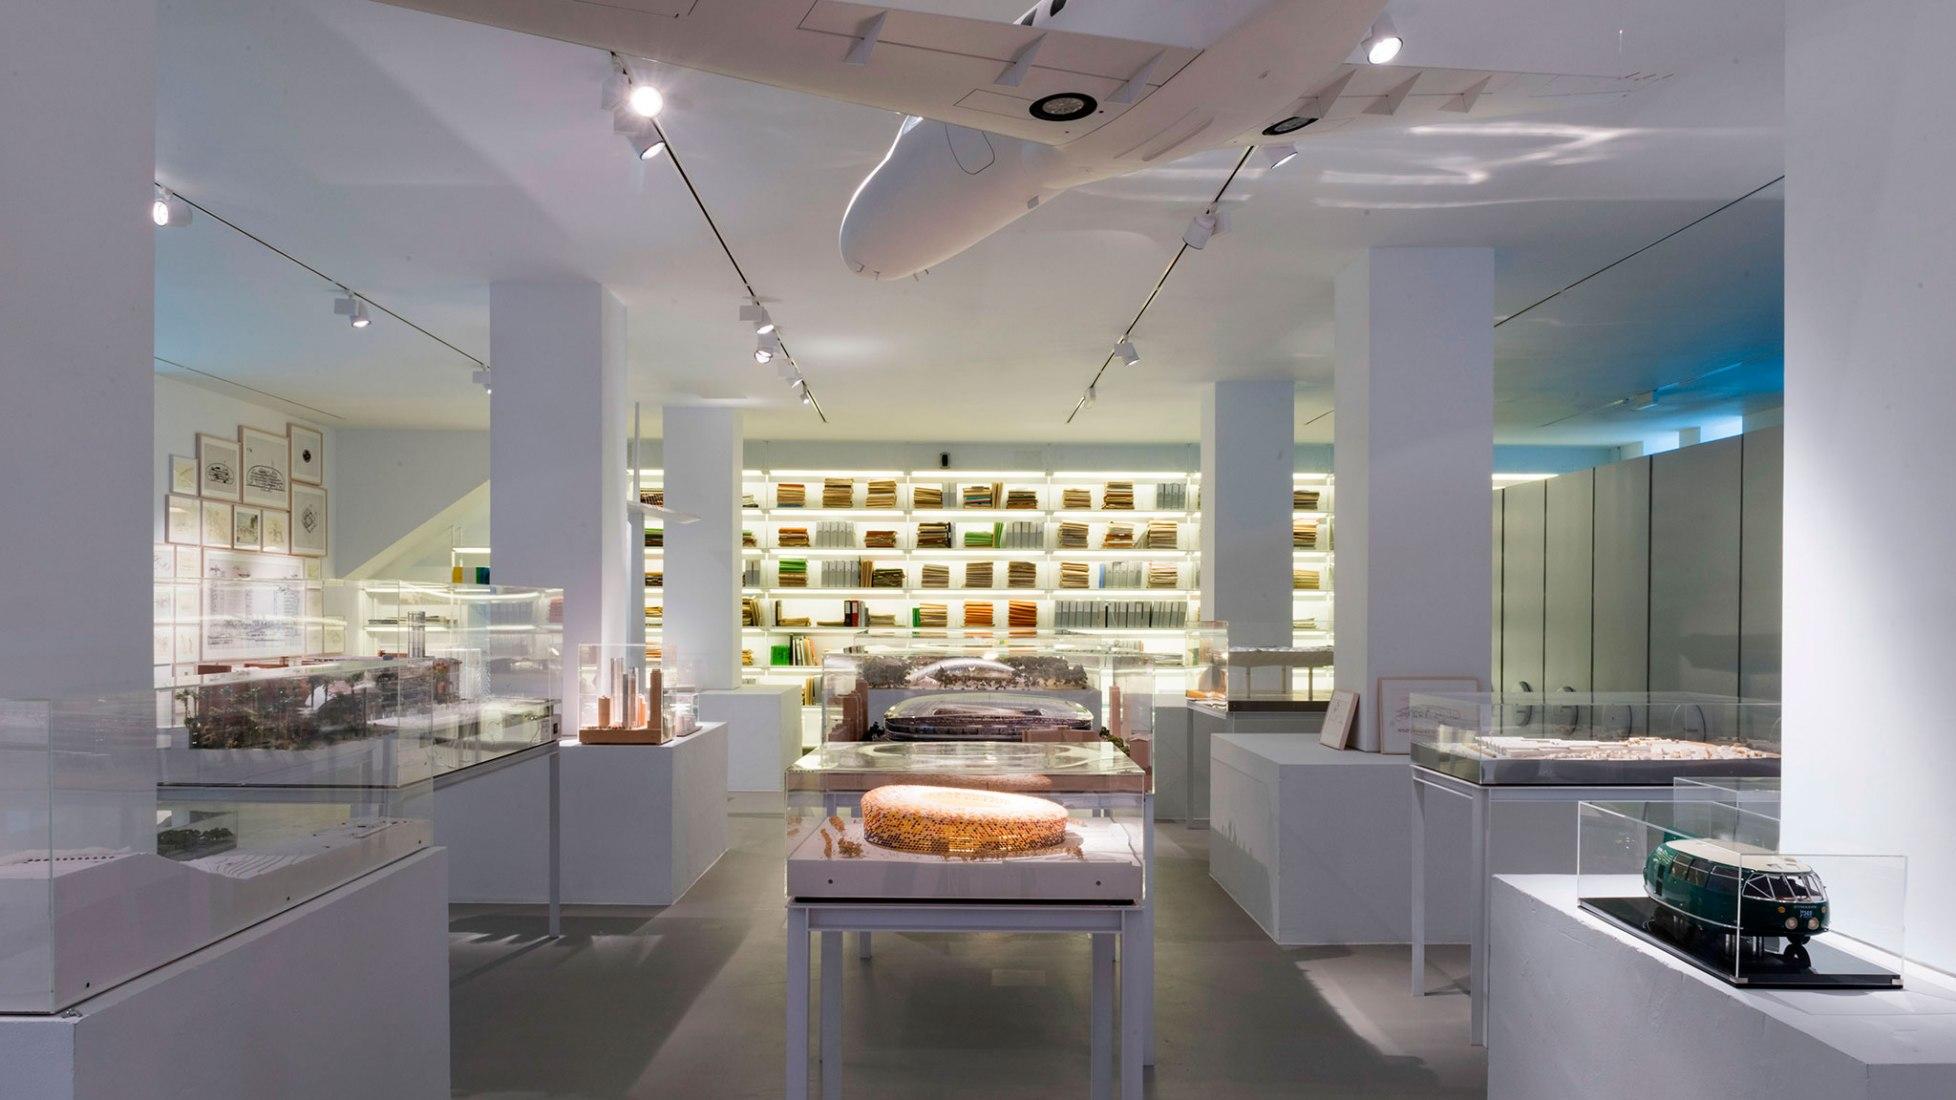 Showroom. Photography © Claudio Álvarez. Image courtesy of Norman Foster Foundation